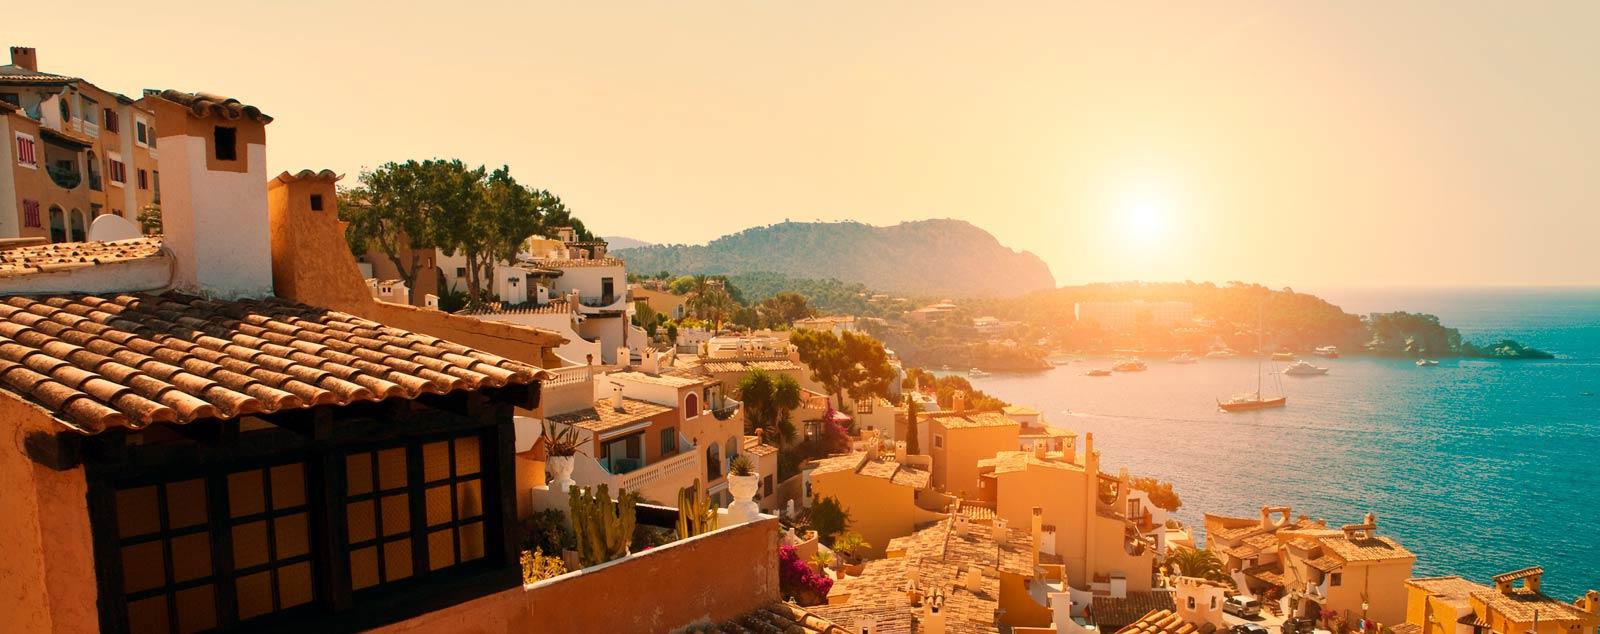 Sunset over an idyllic Mallorcan town